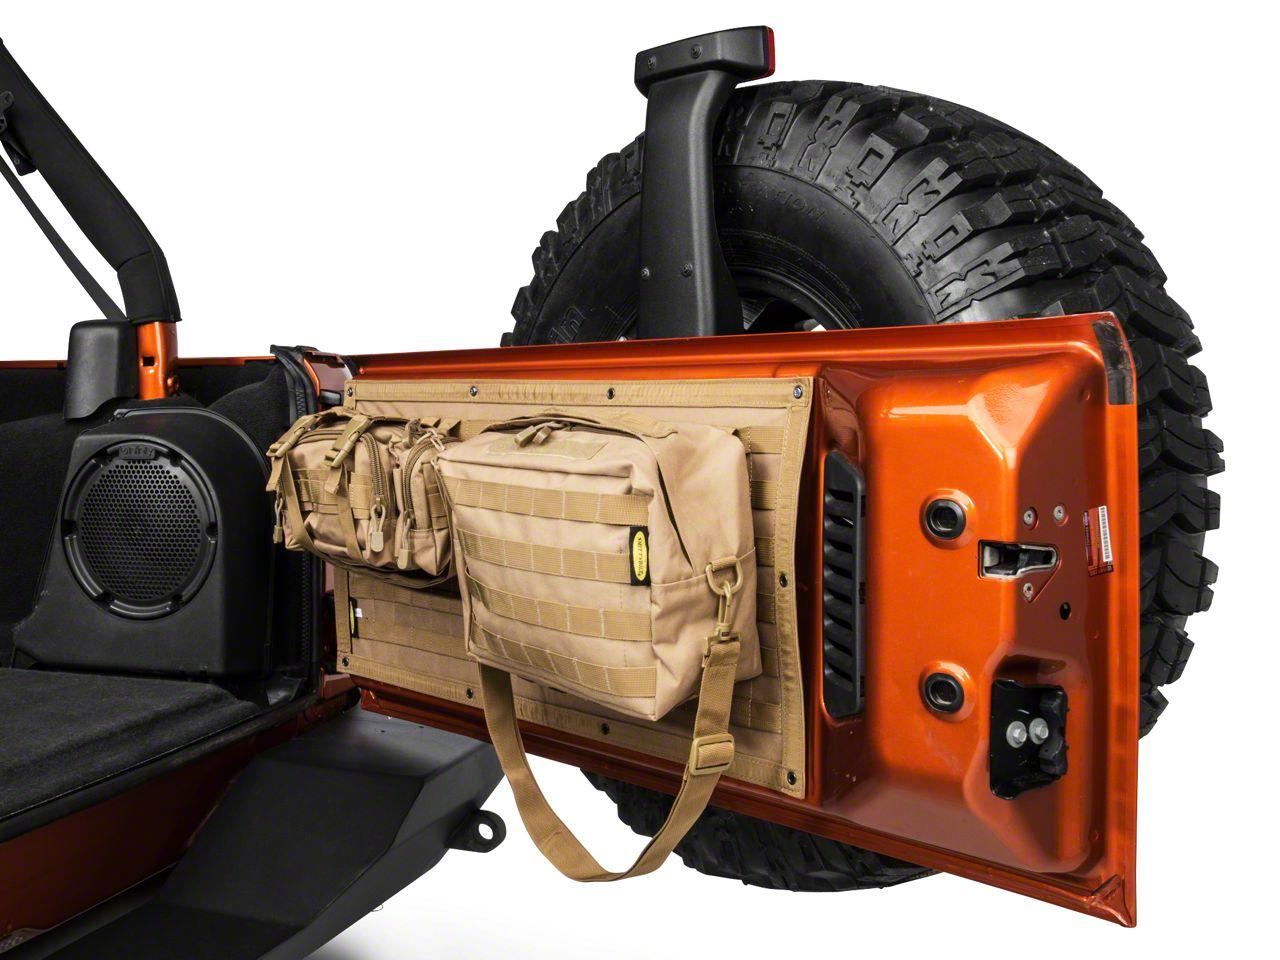 Smittybilt GEAR Tailgate Cover - Coyote Tan (07-18 Jeep Wrangler JK)